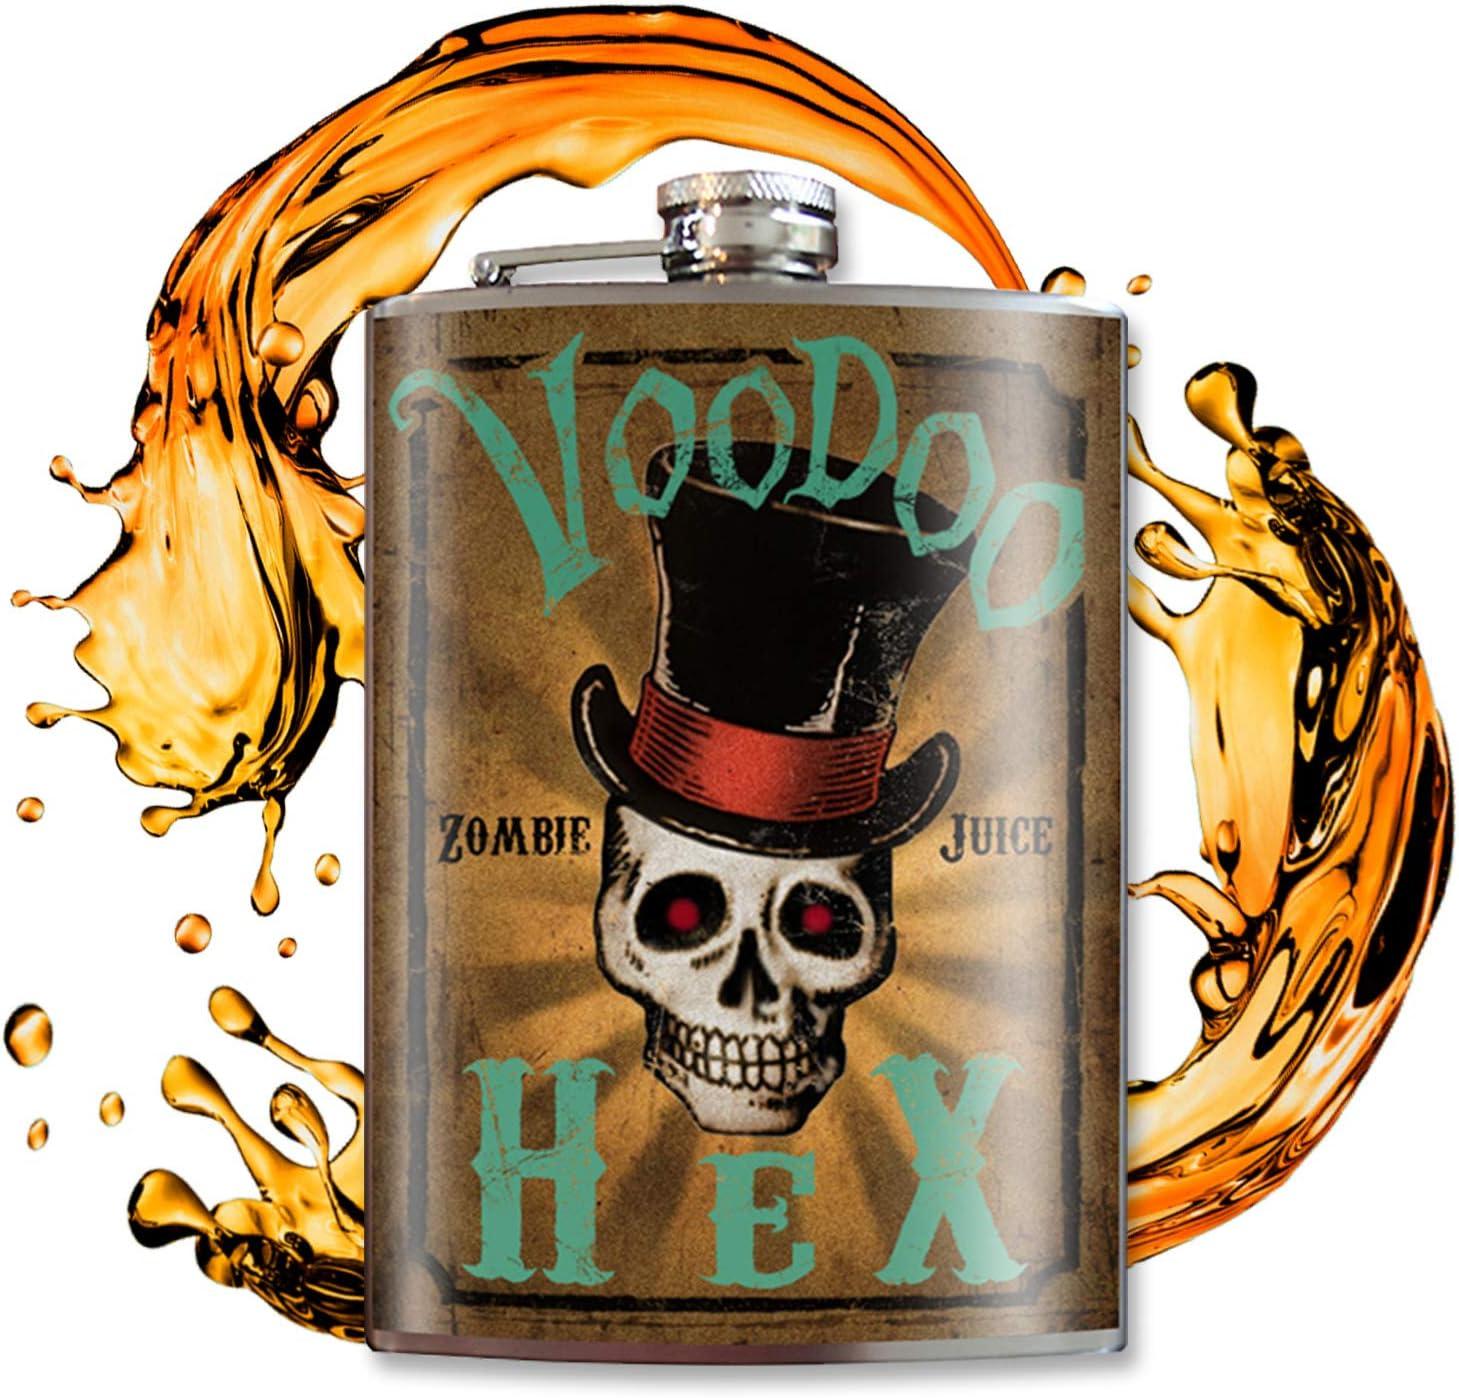 Voodoo Hex Flask Flasks For Liquor For Men Flasks For Liquor For Women Flask For Women Fun Gifts For Women Cool Gifts For Men